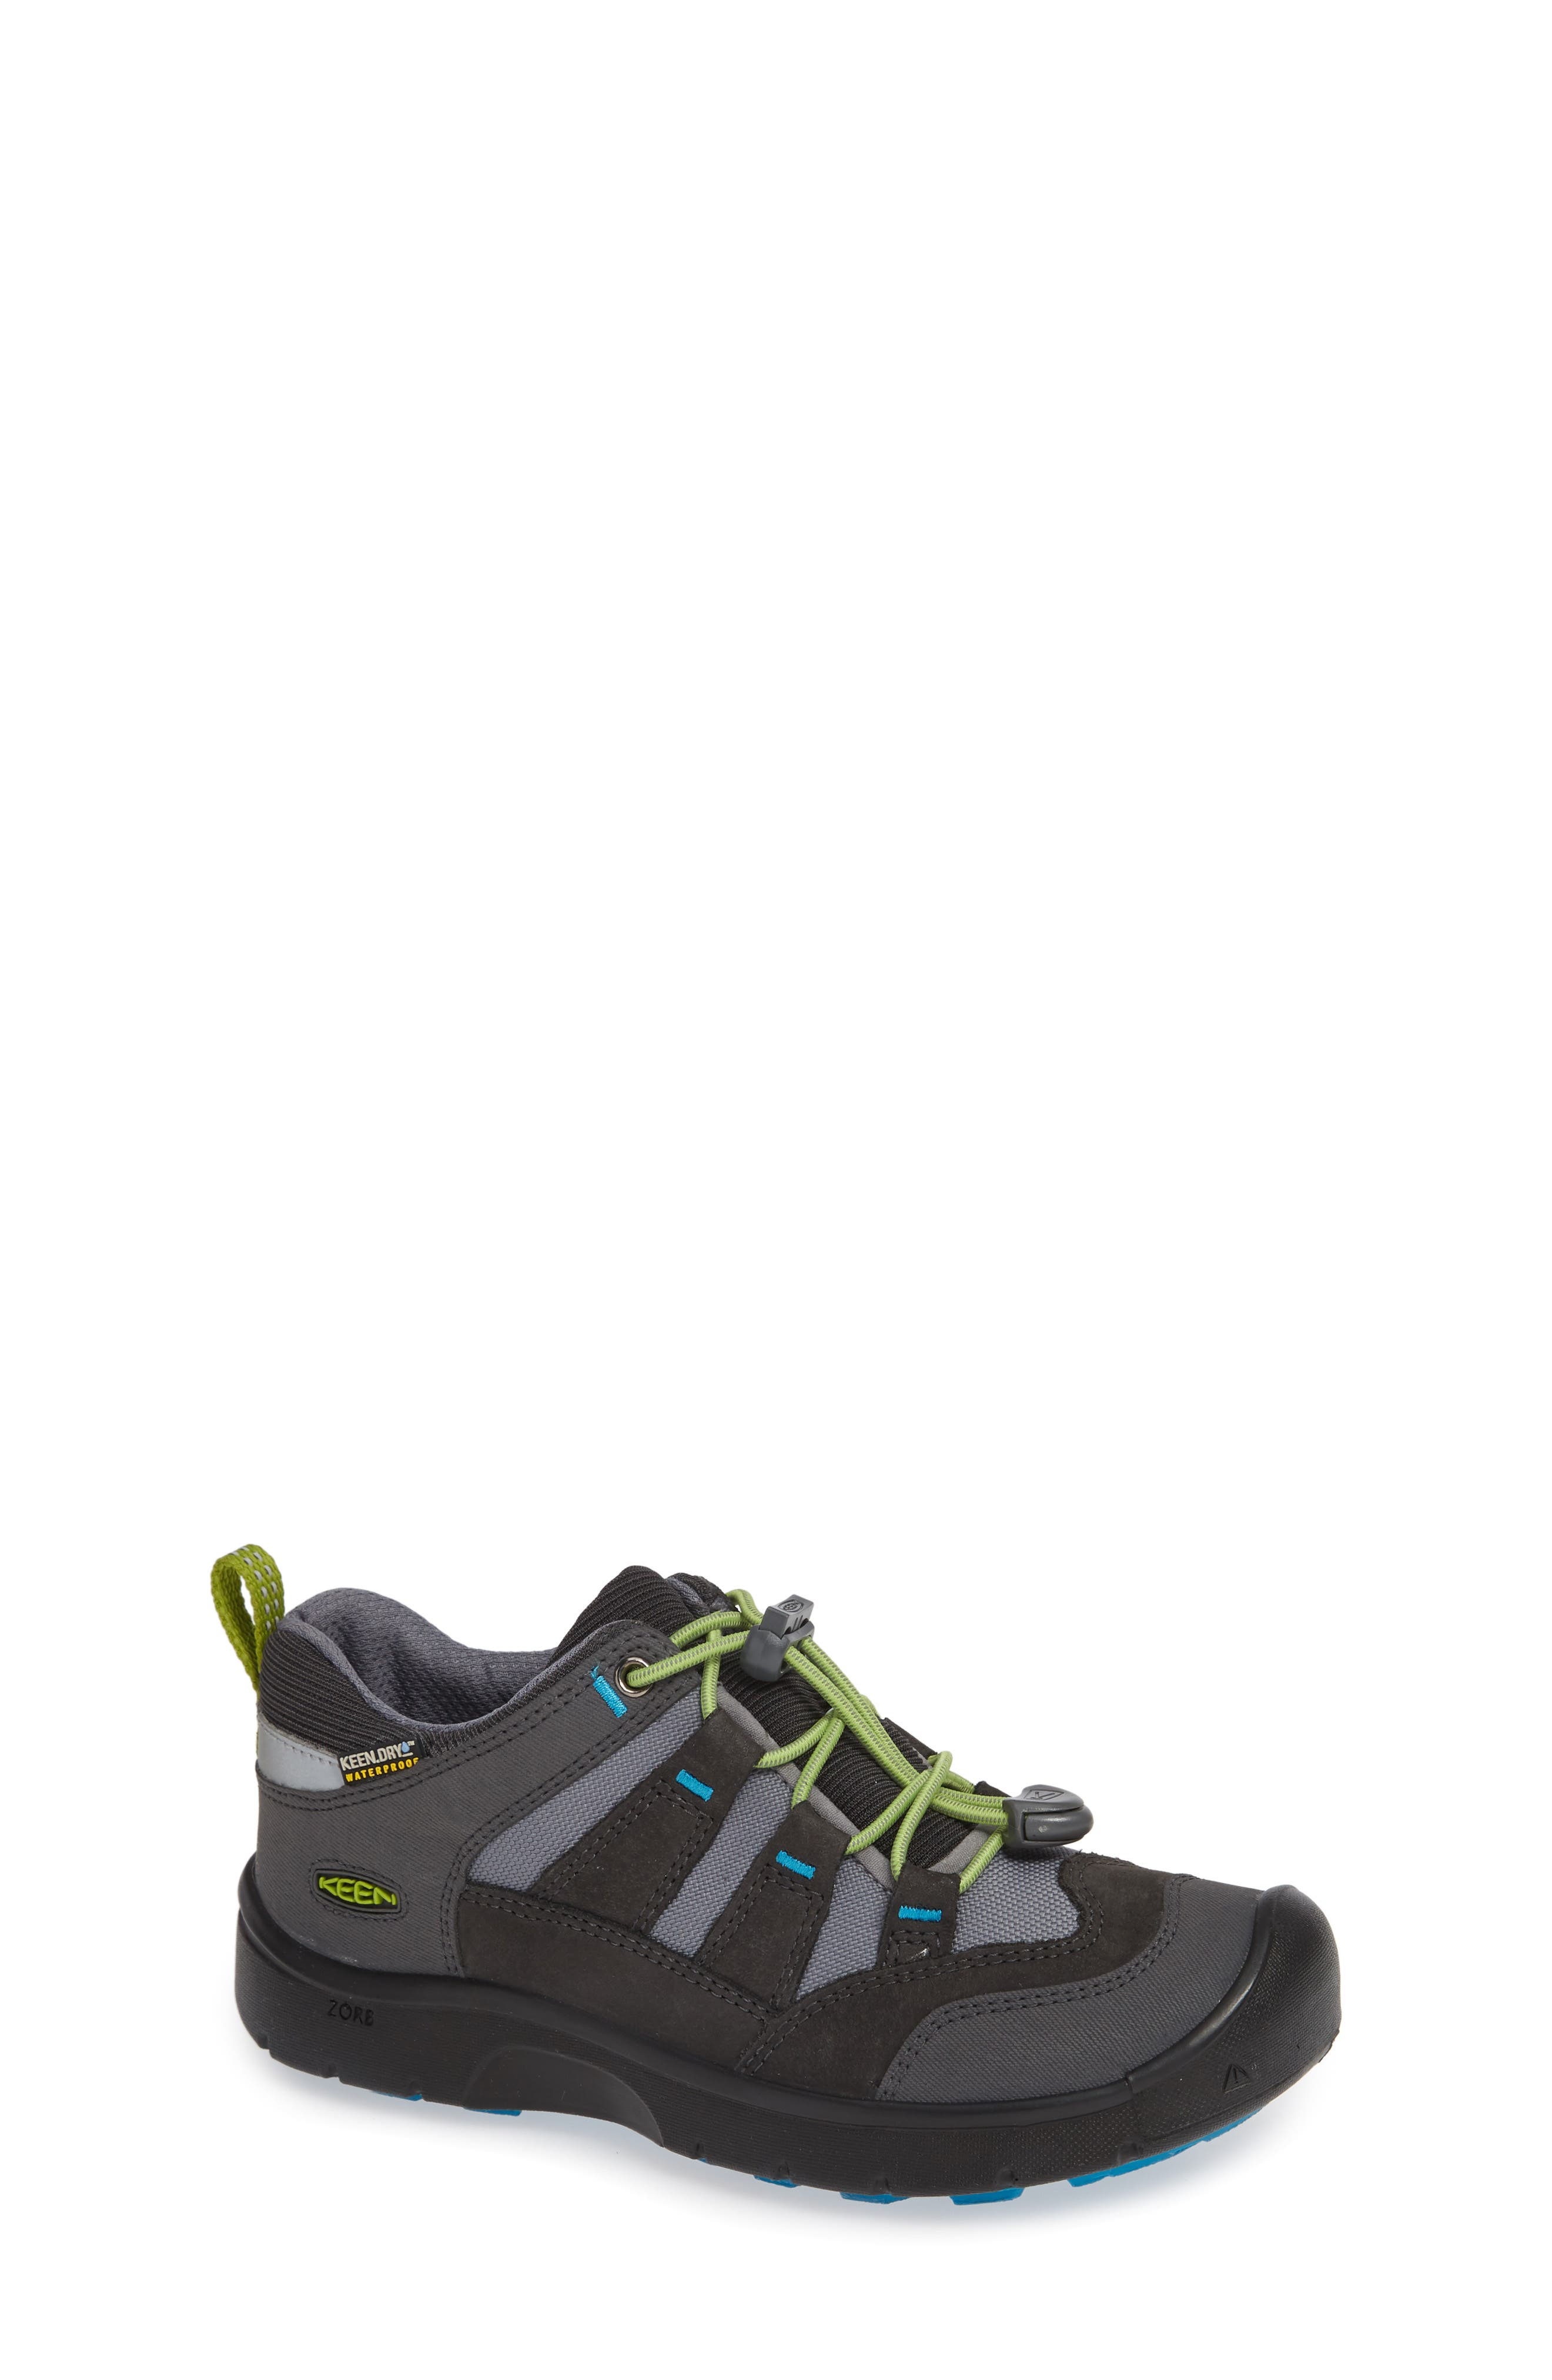 Hikeport Waterproof Sneaker,                             Main thumbnail 1, color,                             MAGNET/ GREENERY/ GREENERY